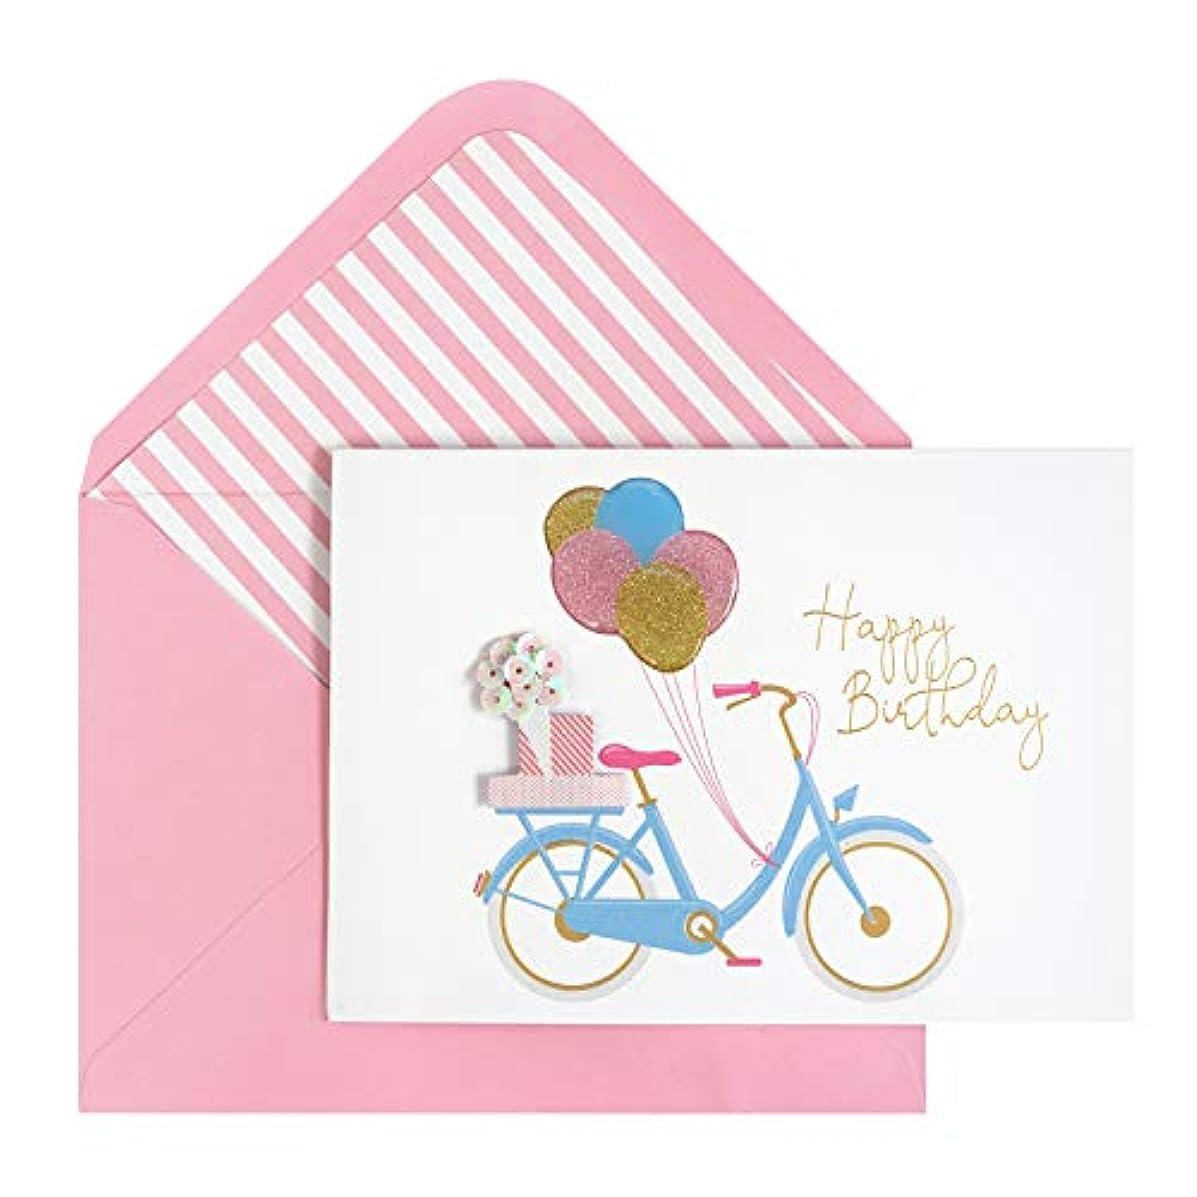 Paislee Paperie 353639 Bike Birthday Greeting Card, Pink Glitter